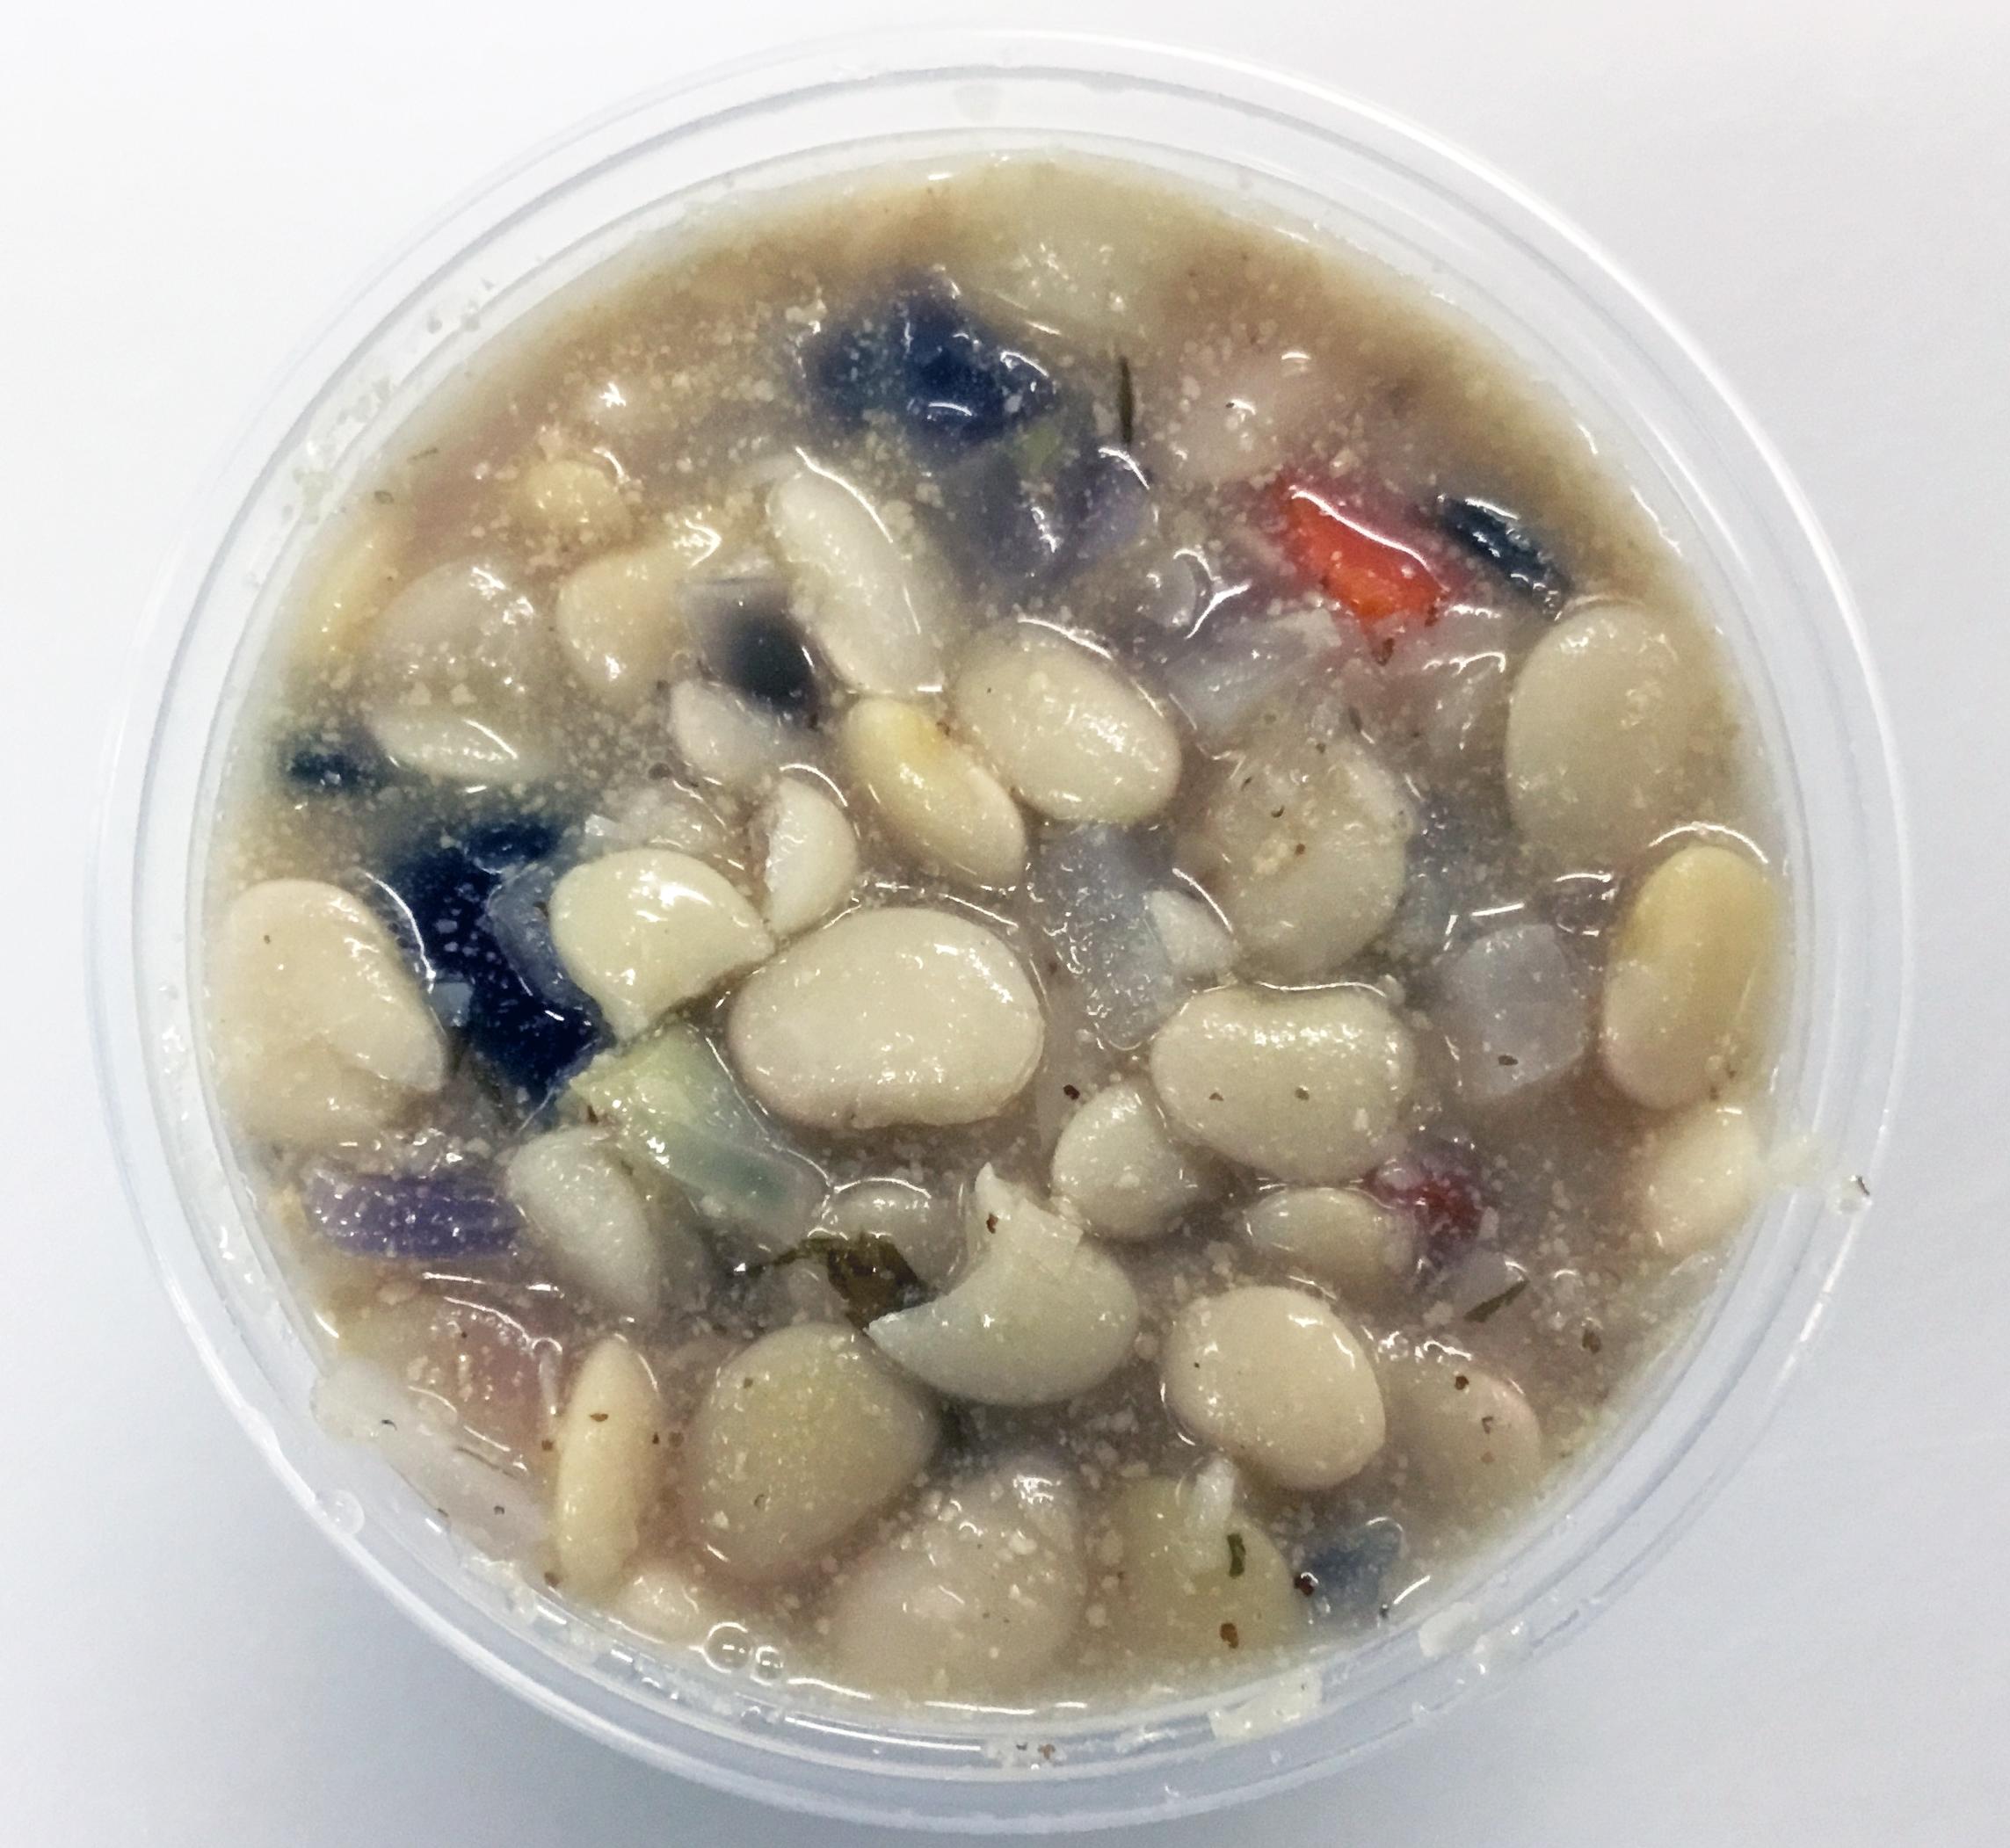 Baby lima bean soup with carrot, daikon radish, red onion, tahini, stone ground mustard, and kombu (seaweed).